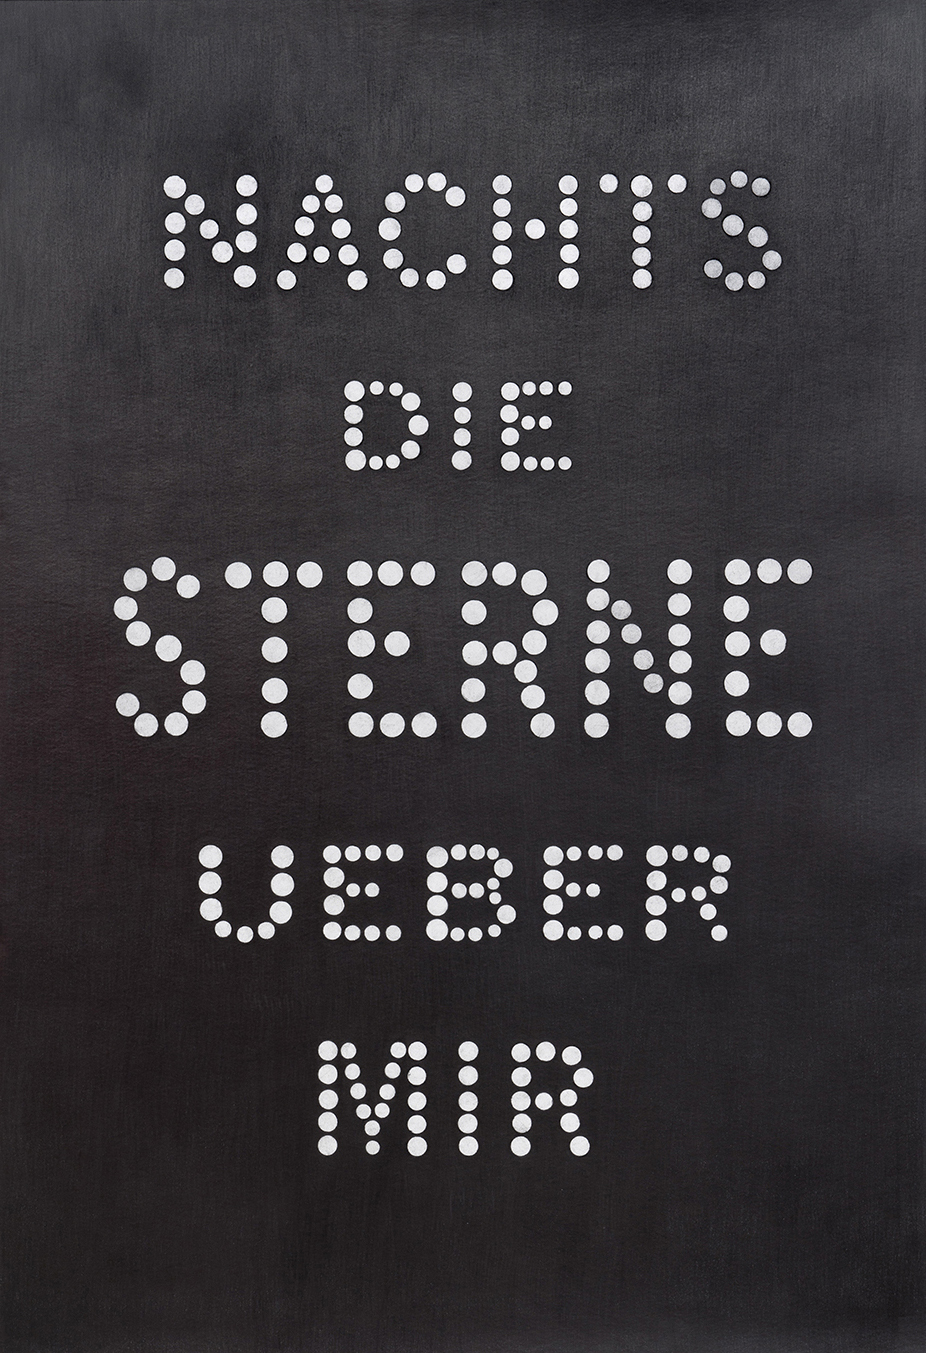 "Carl Trahan, The Sacred Canopy - Nachts dia Sterne uber mir, 2018, graphite sur papier, 111 x 77 cm (44"" x 30"")"